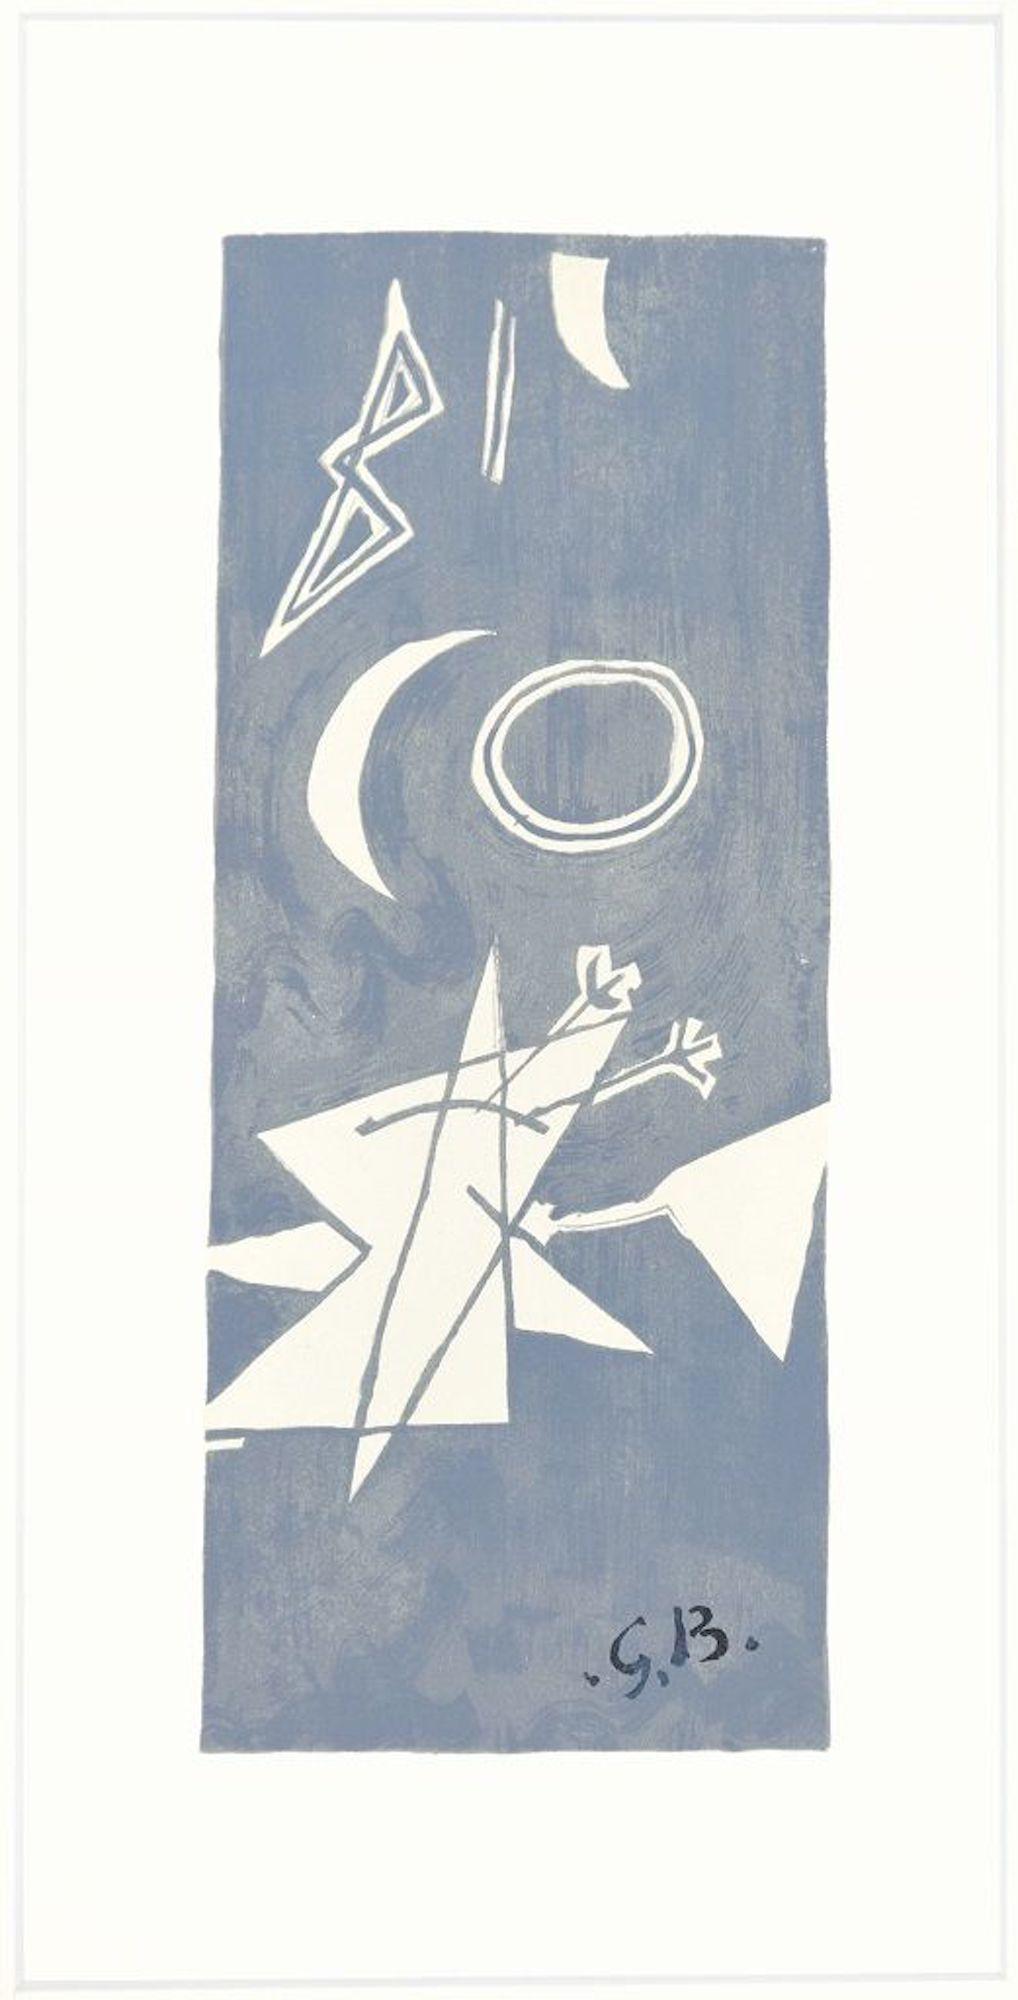 Ciel Gris II  - Original Lithograph by Georges Braque - 1959